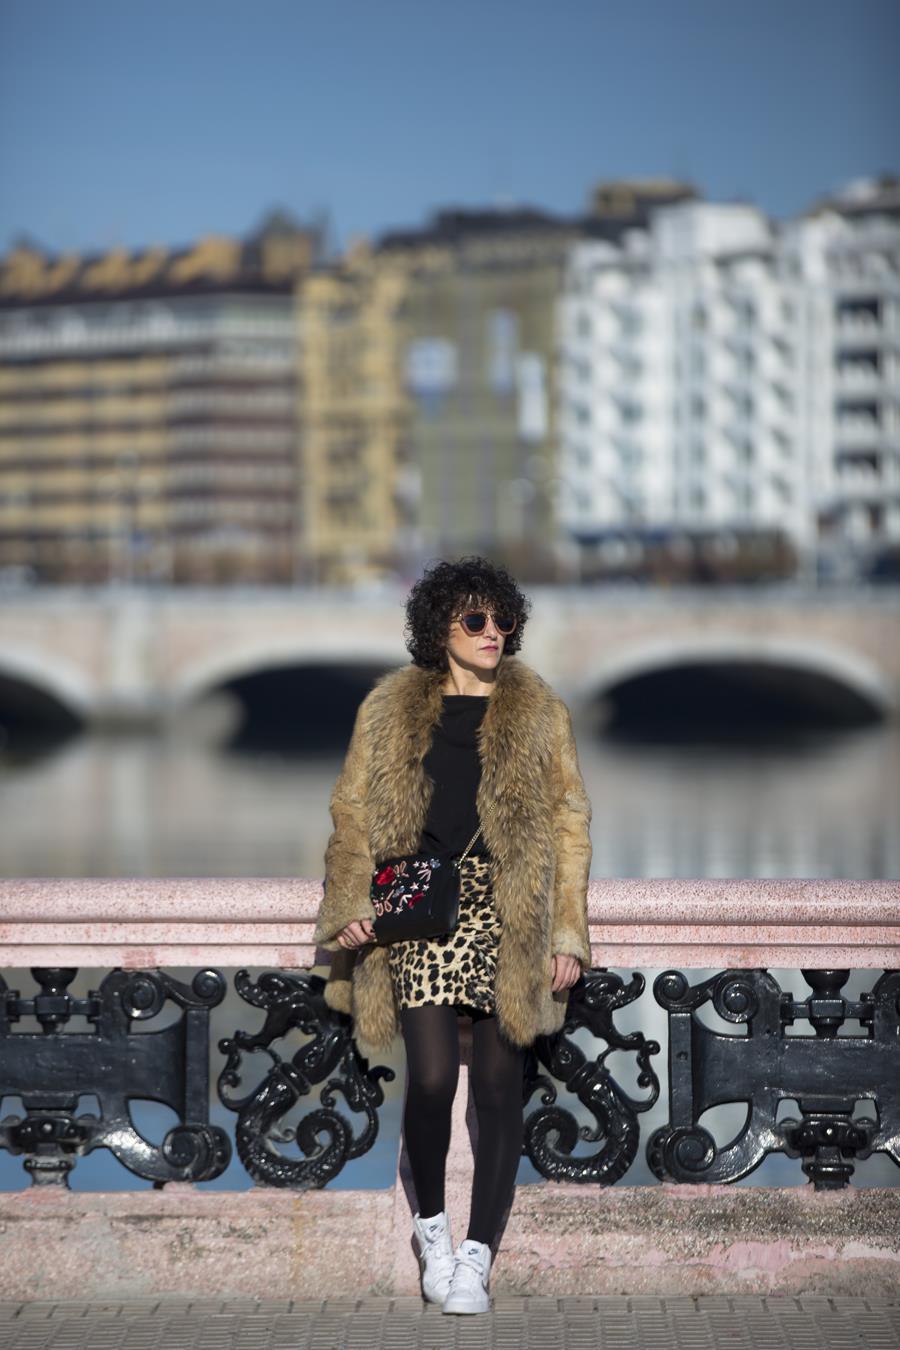 Rebeca Valdivia, Personal Shopper, Donostia, San Sebastián, Miss Clov, animal print, mini skirt, mini falda leopardo, volantes, frills, jersey de lana, wool sweater, leather, faux fur coat, abrigo de piel, sneaker, zapatillas bota, Nike, sstreetstyle, curls, curlpower